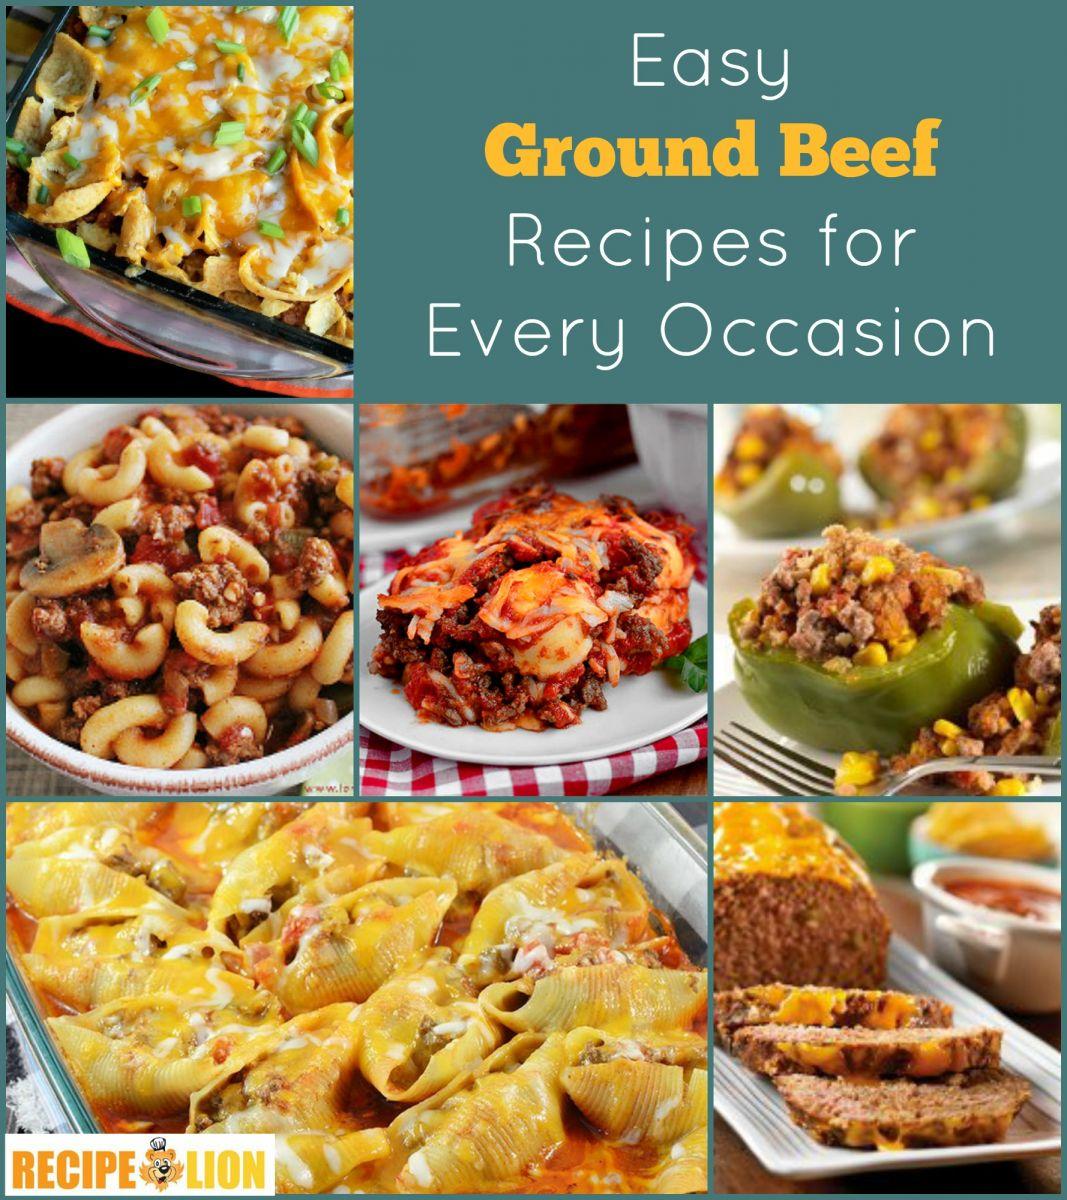 133 Easy Ground Beef Recipes